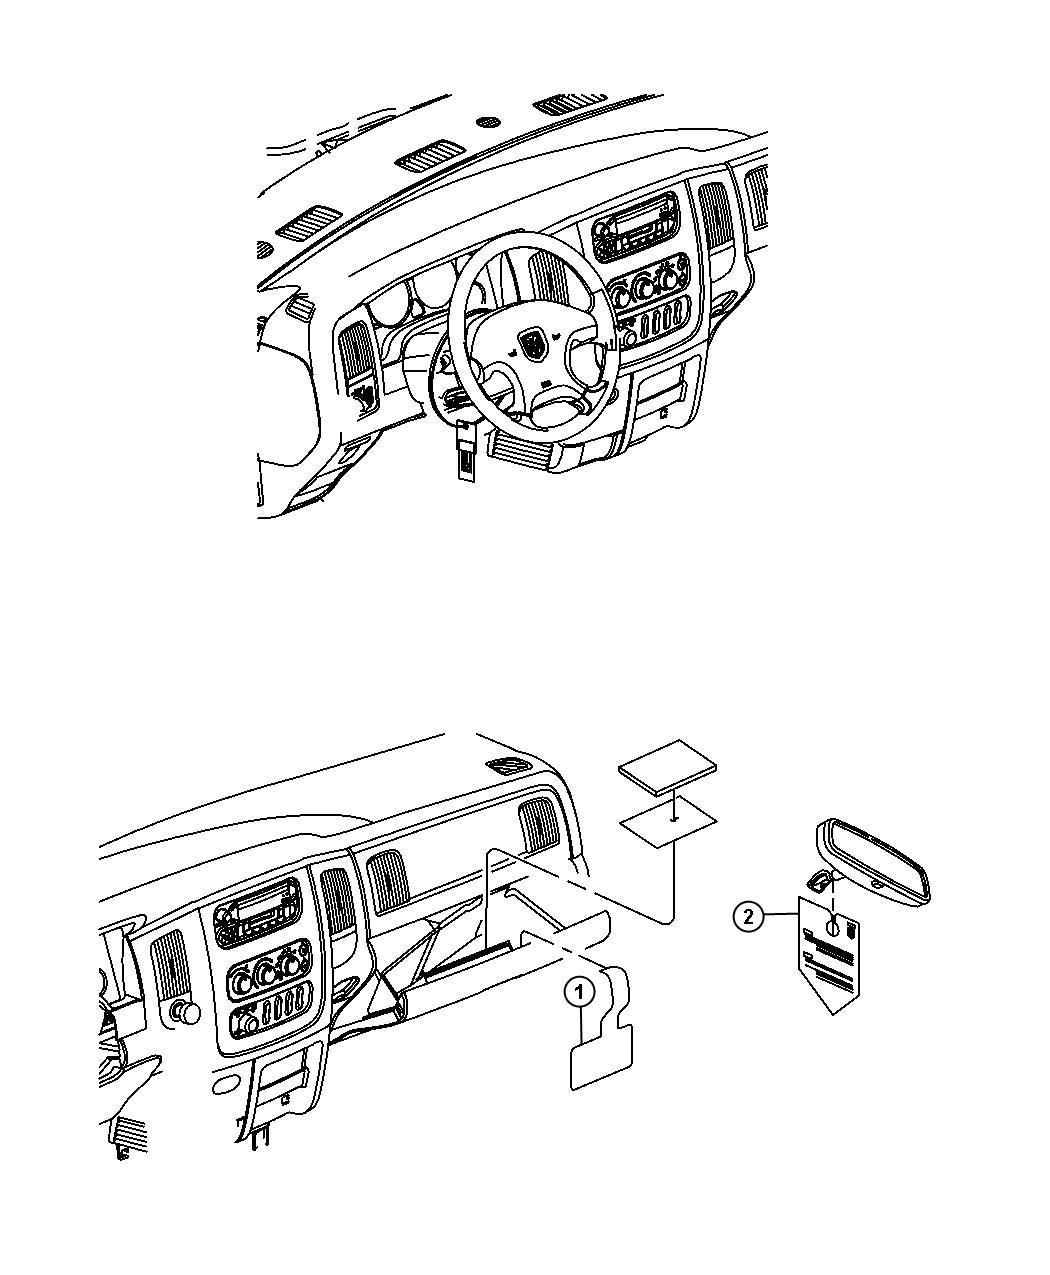 Dodge Ram 2500 Label. Diesel fuel. Four wheel drive